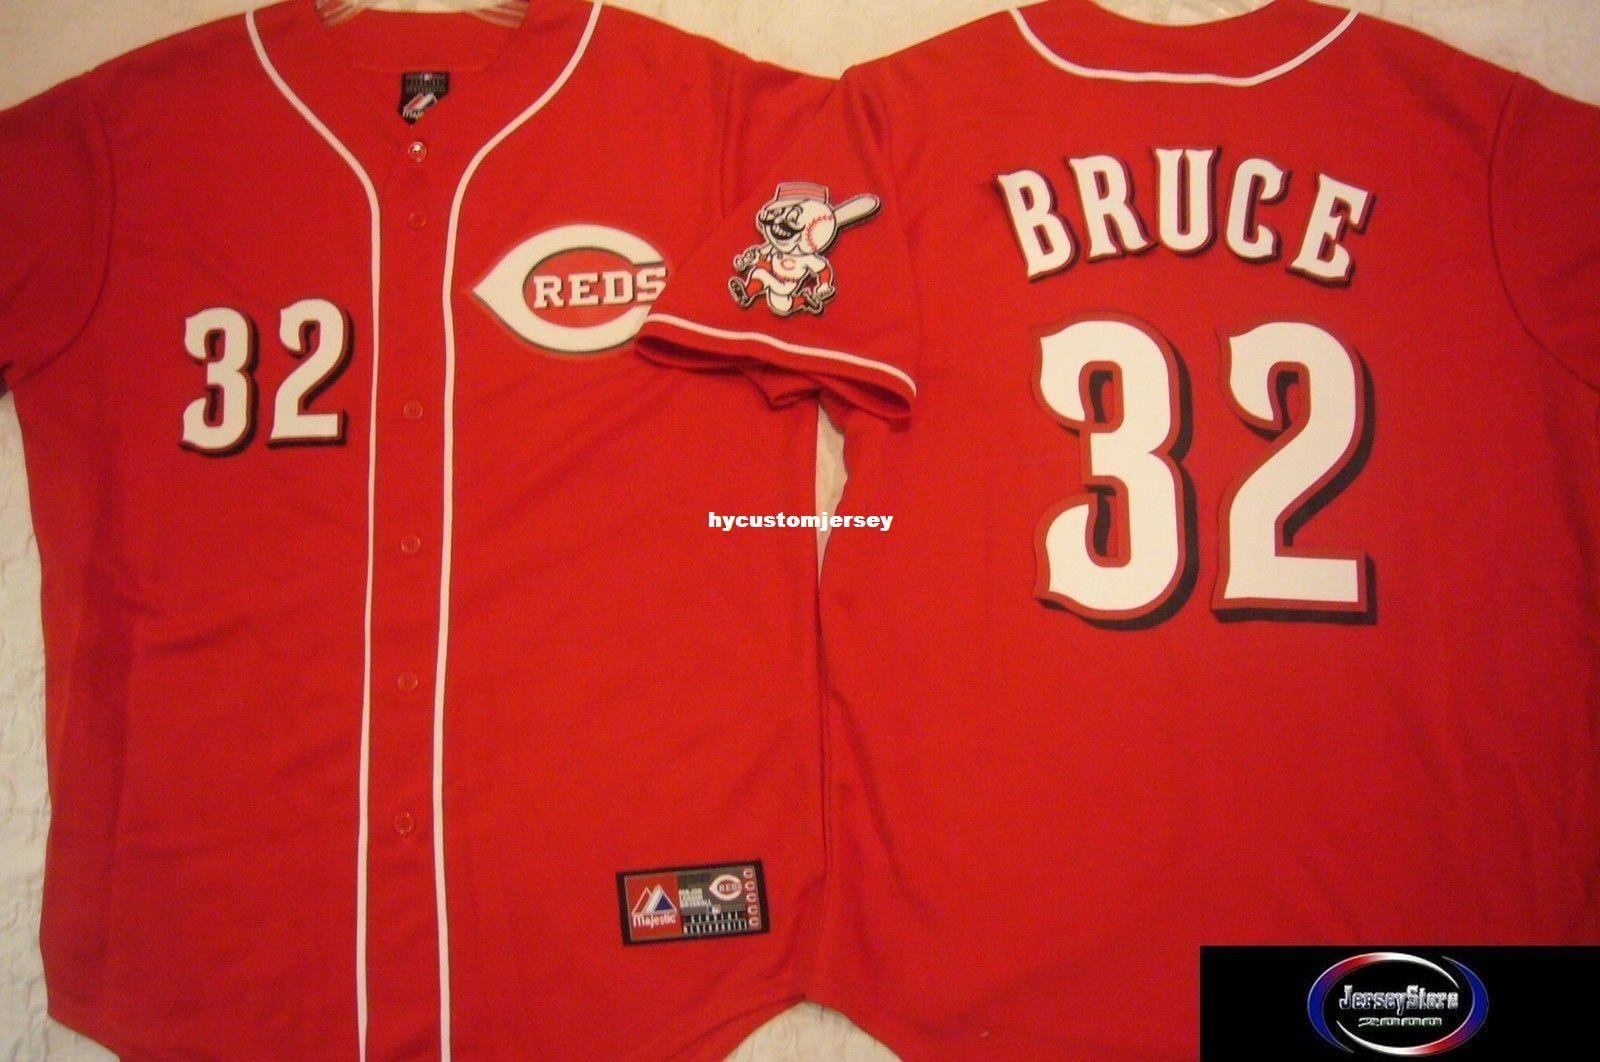 cheap custom MAJESTIC #32 JAY BRUCE SEWN Baseball Jersey W/RED LEG PATCH Mens stitched jerseys Big And Tall SIZE XS-6XL For sale